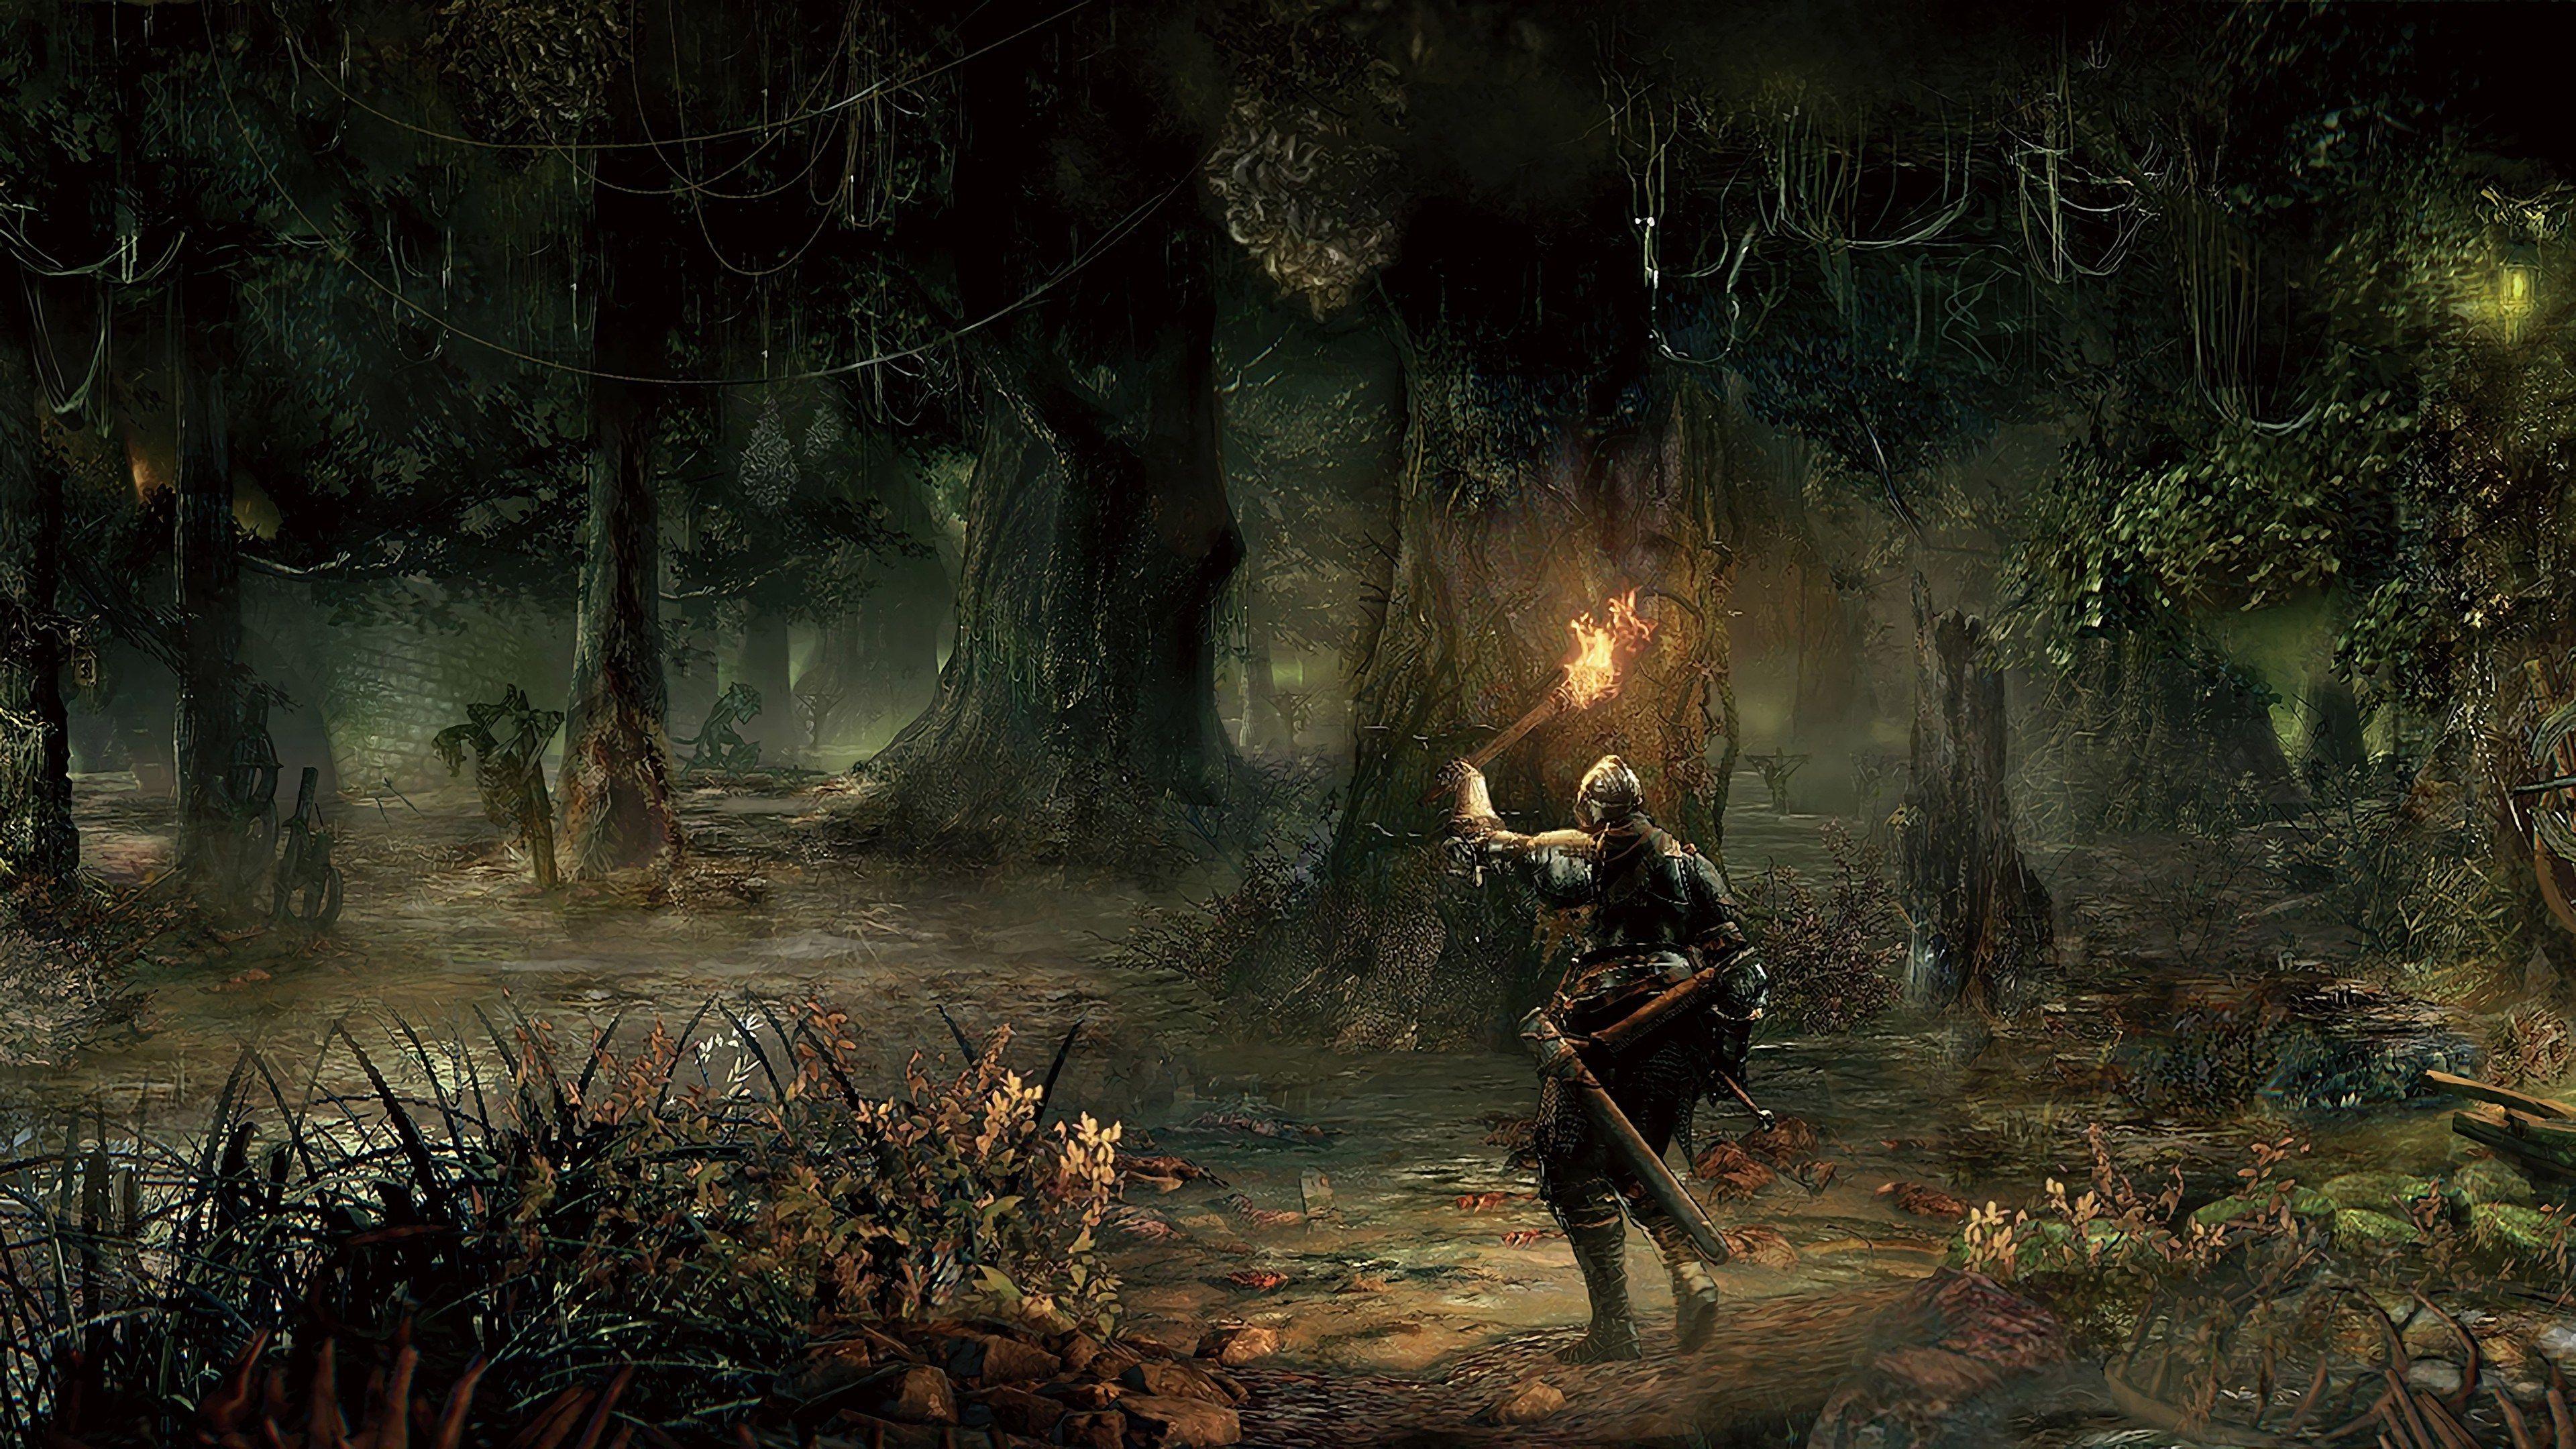 Download Dark Souls Iii 4k Wallpaper Free 4k Wallpaper Dark Souls Wallpaper Dark Souls Dark Souls Game